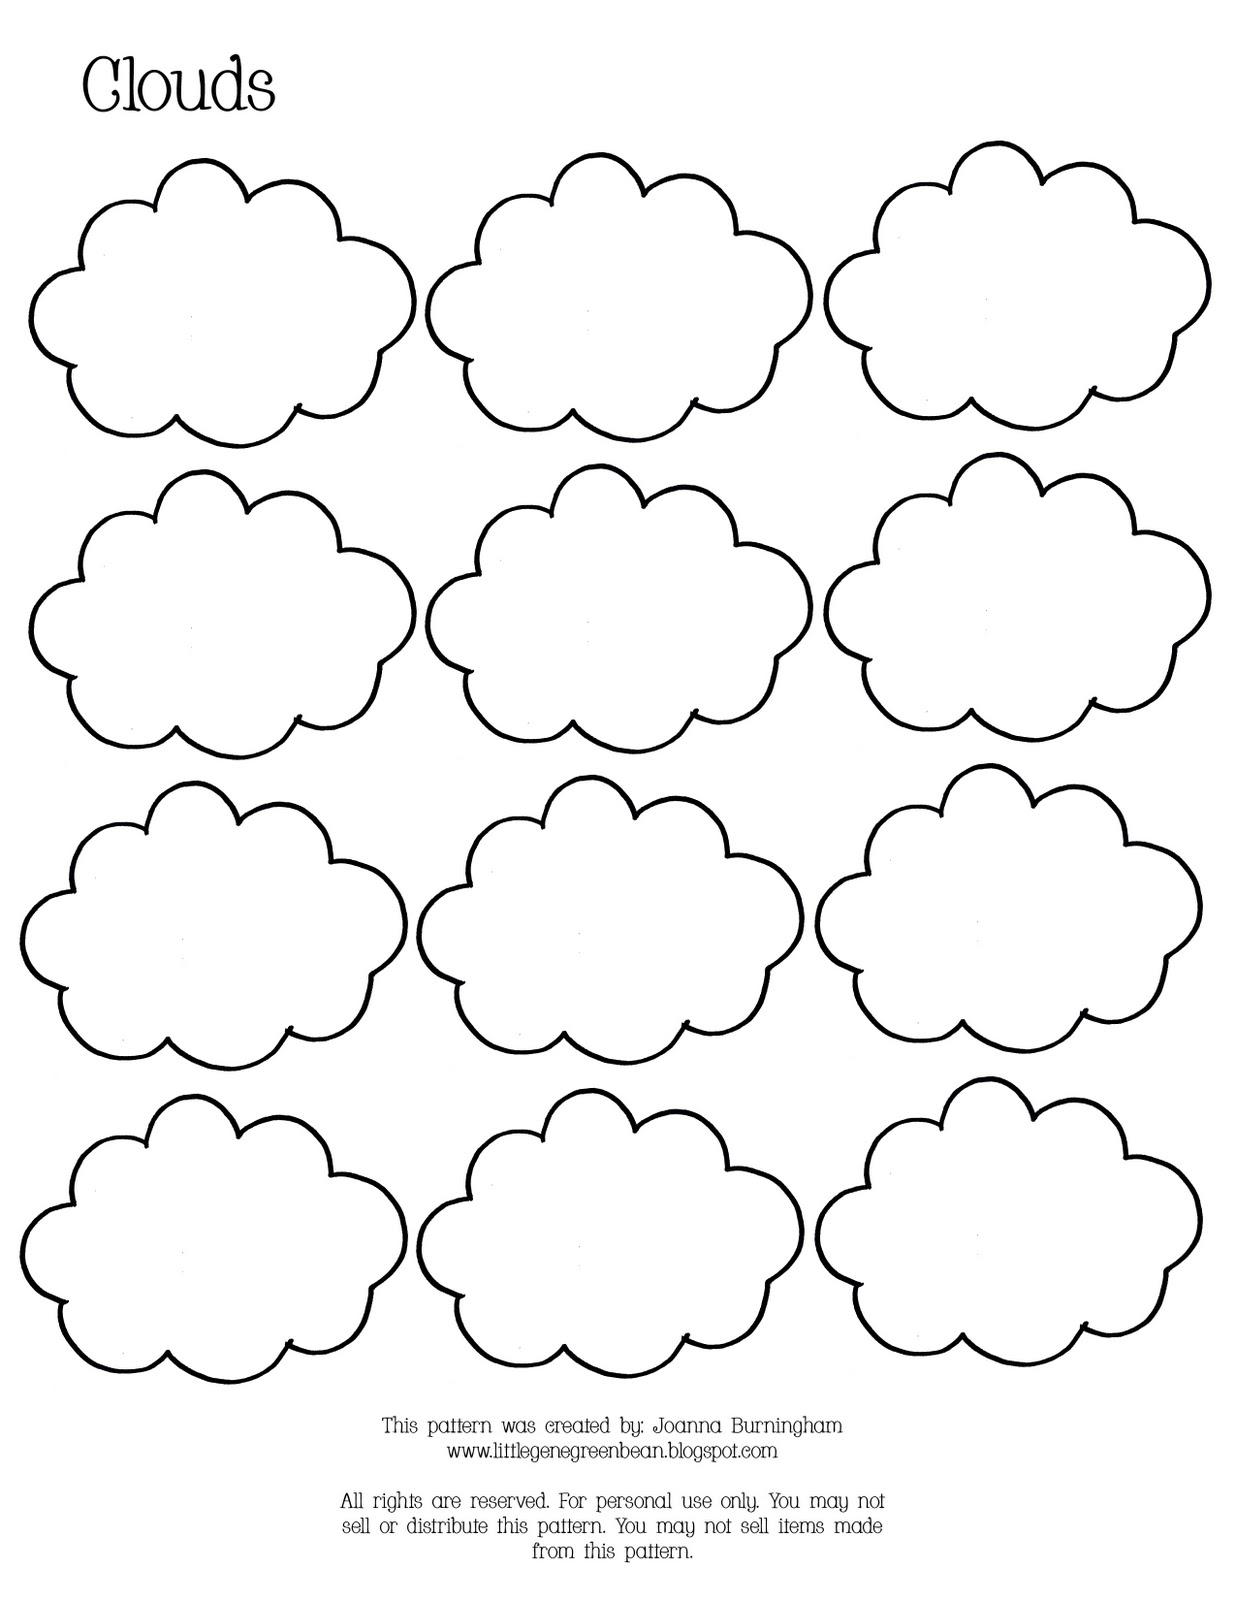 Little Gene Green Bean: Rain and Clouds: Unit 4